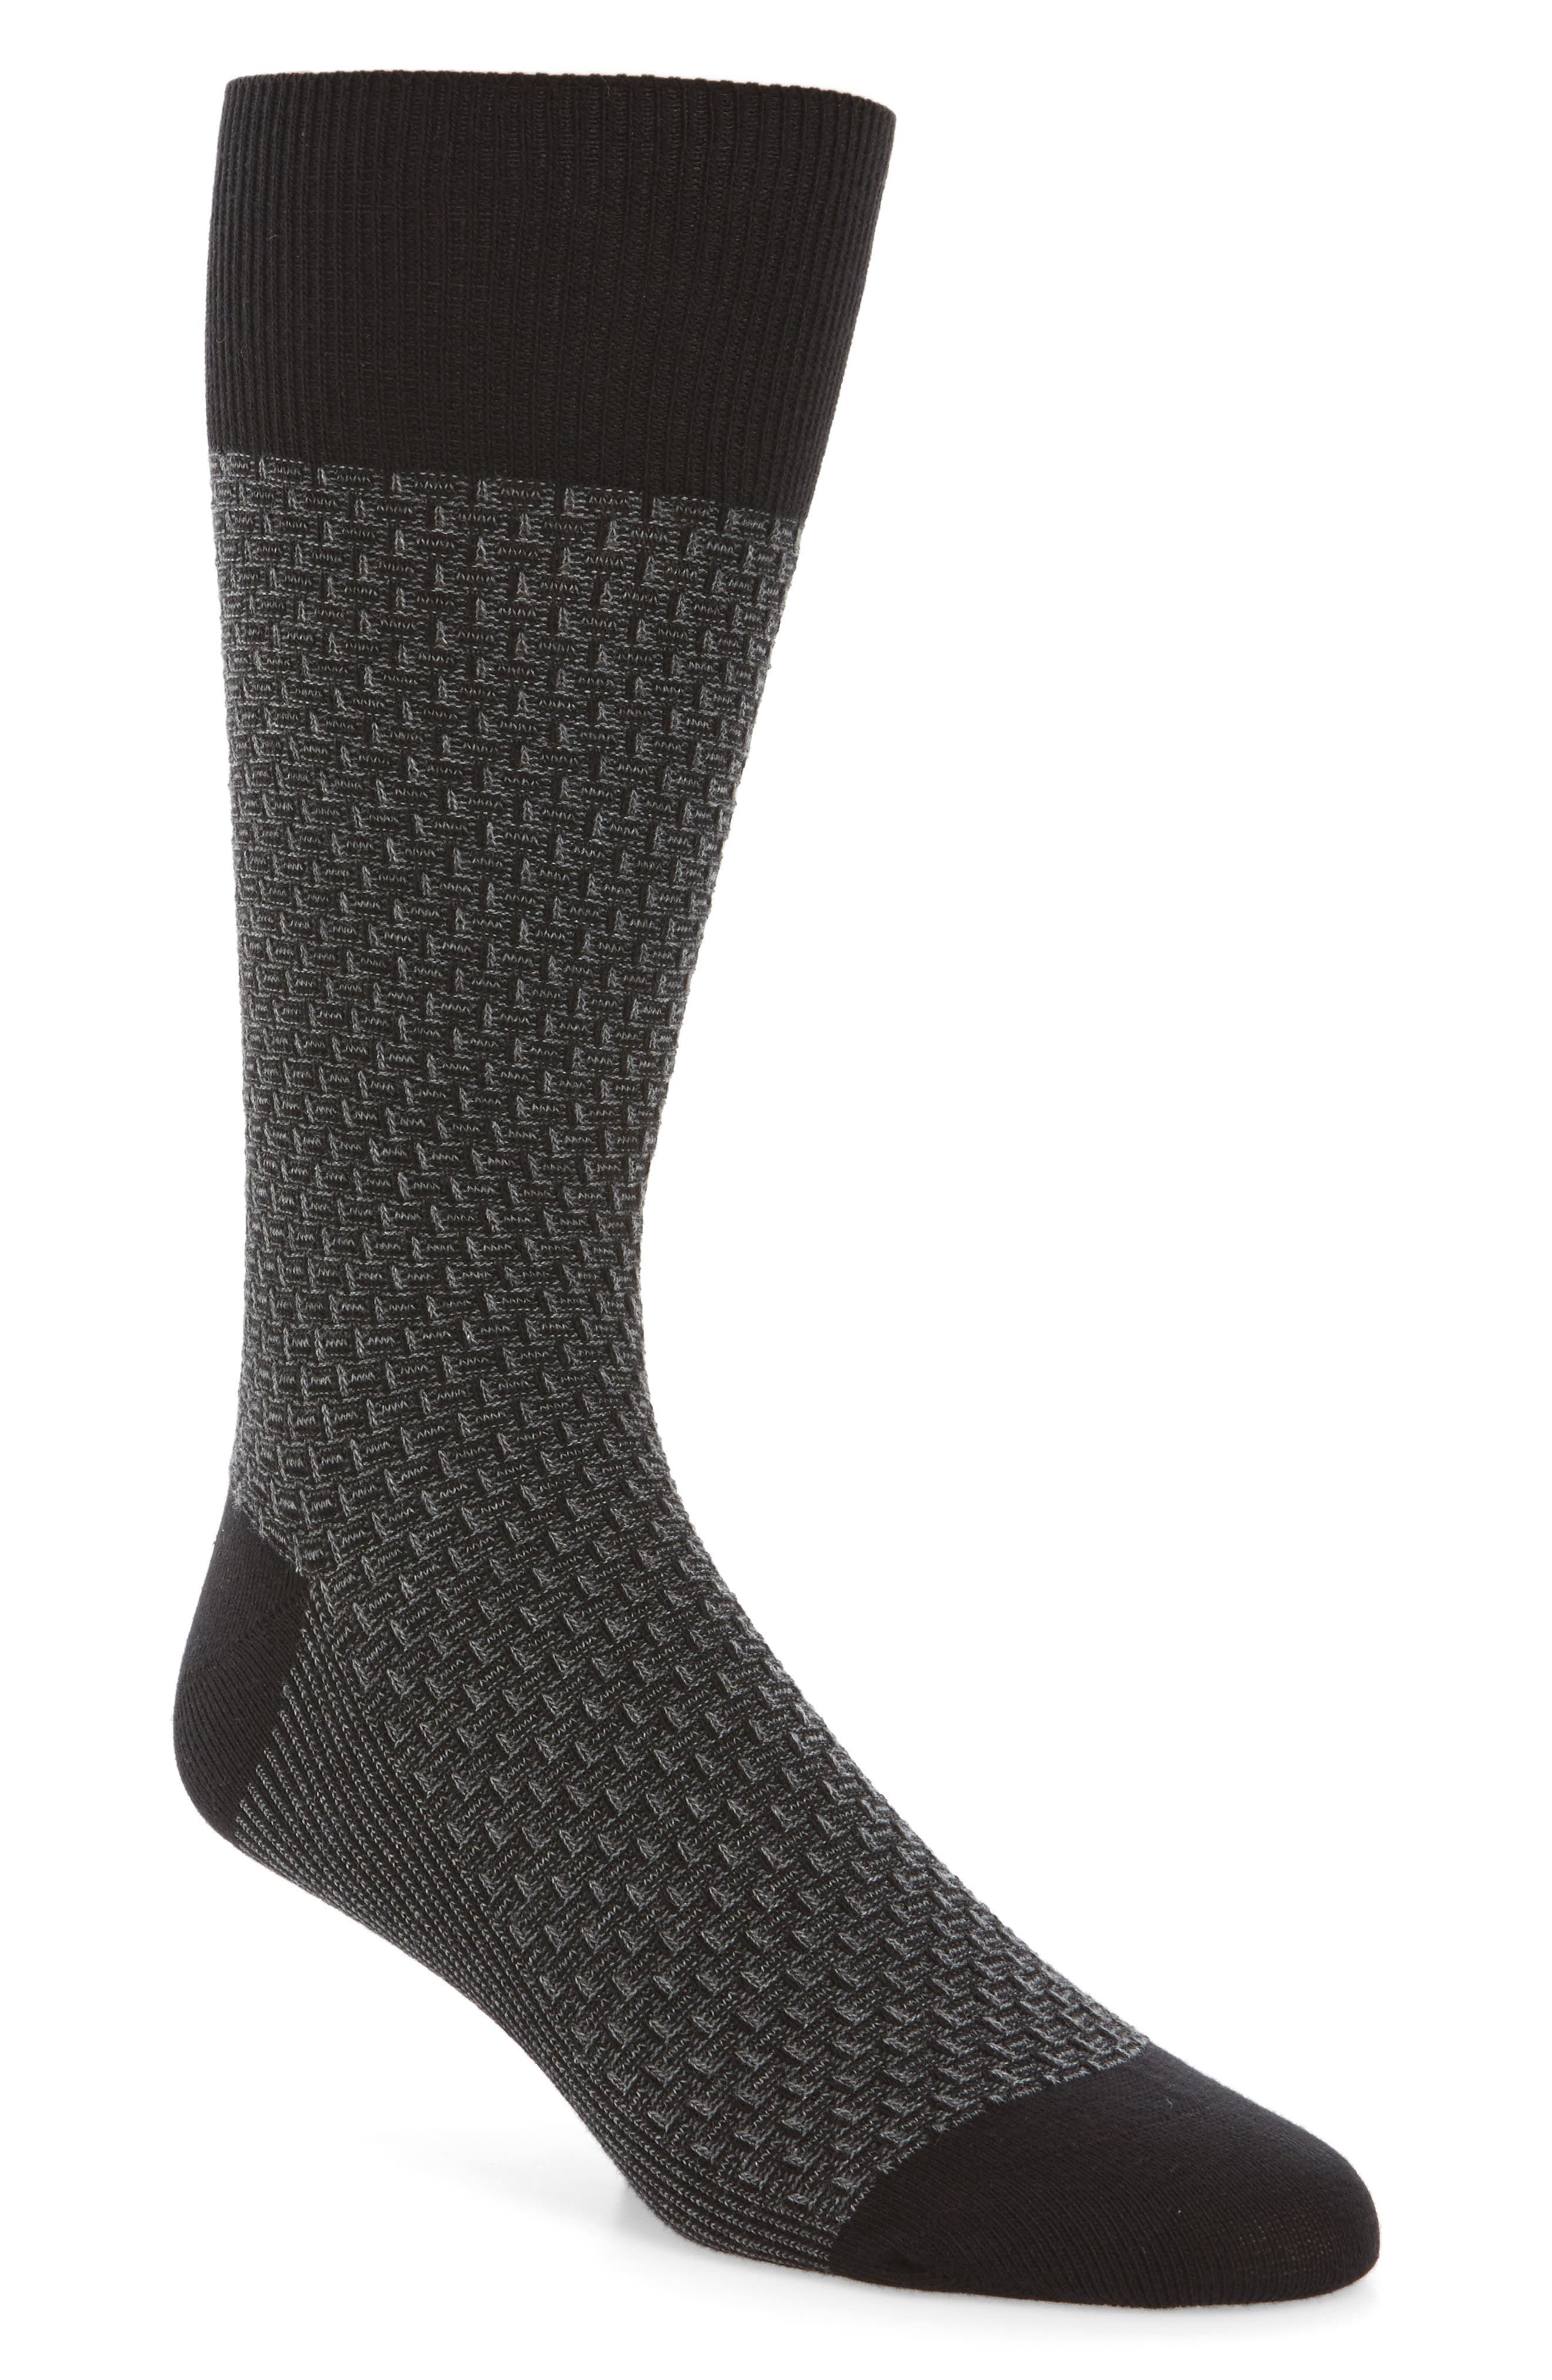 Main Image - Cole Haan Dog Bone Texture Crew Socks (3 for $30)